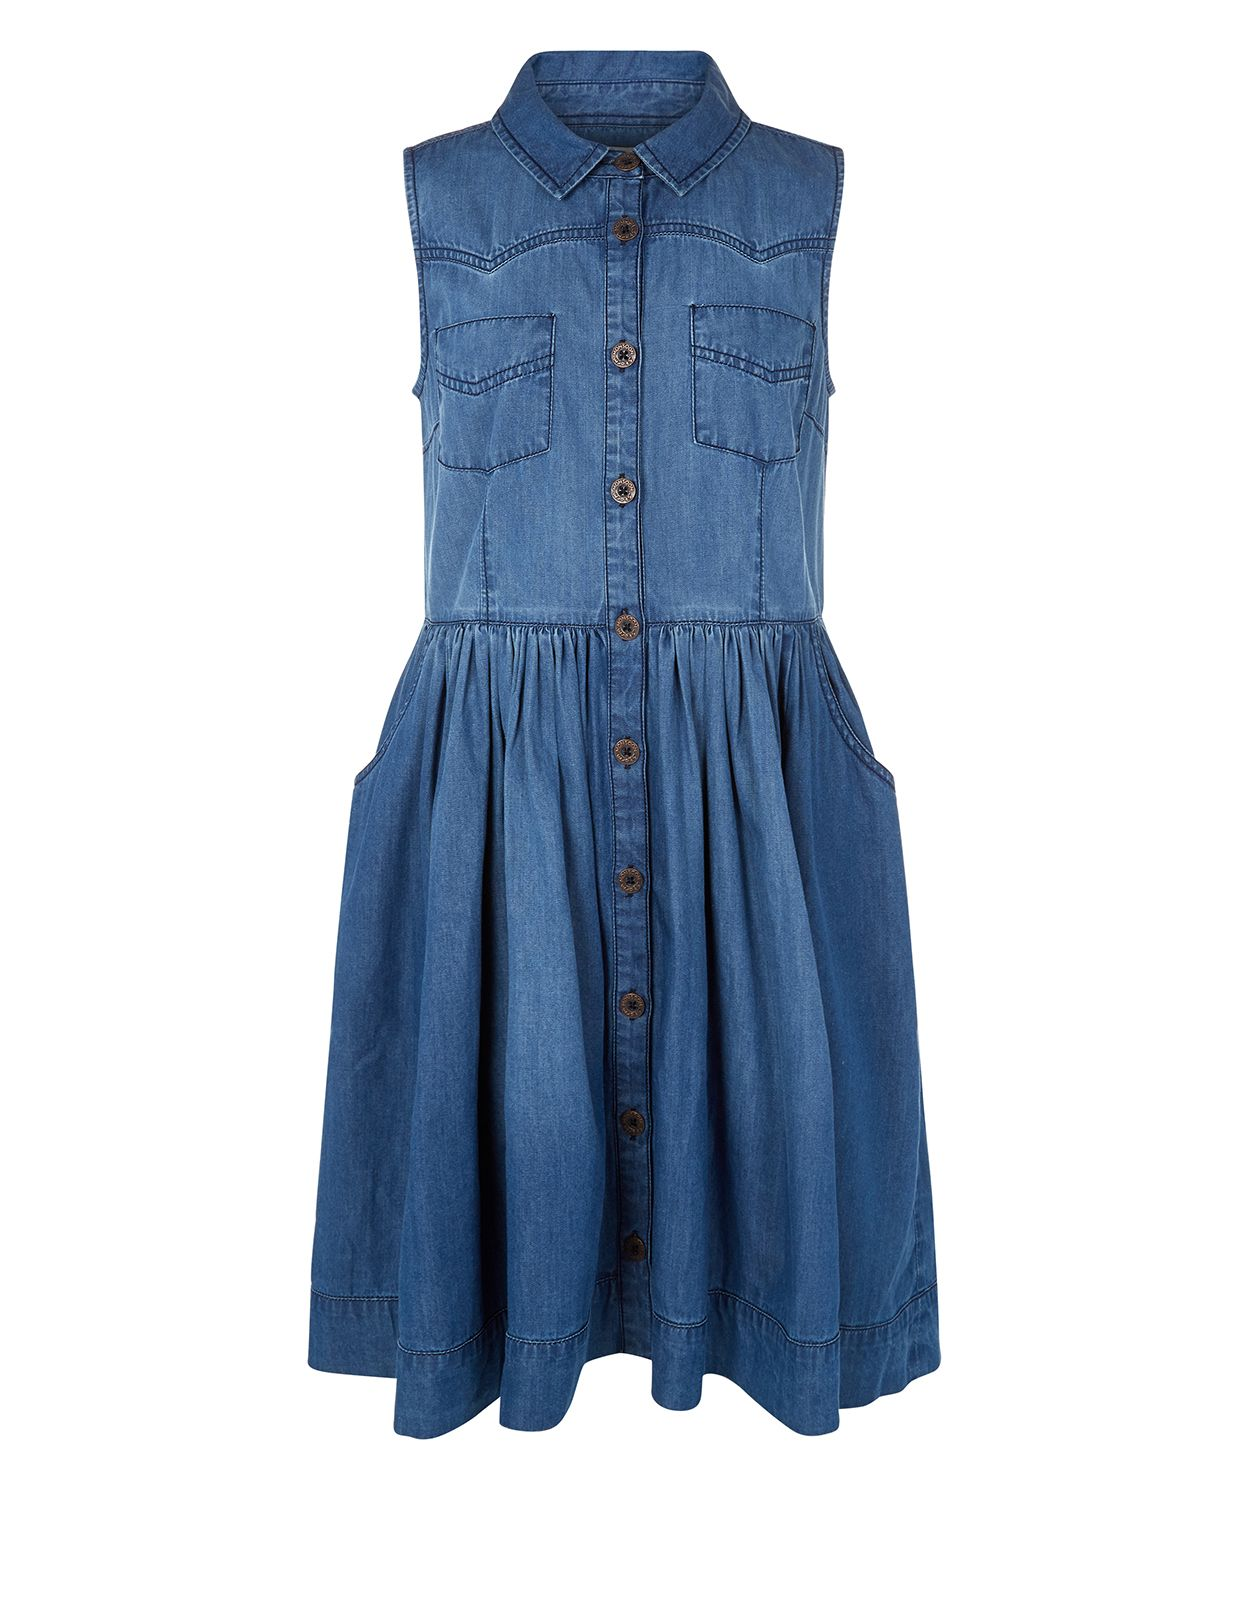 45ec8e27dd5 Adele Denim Dress